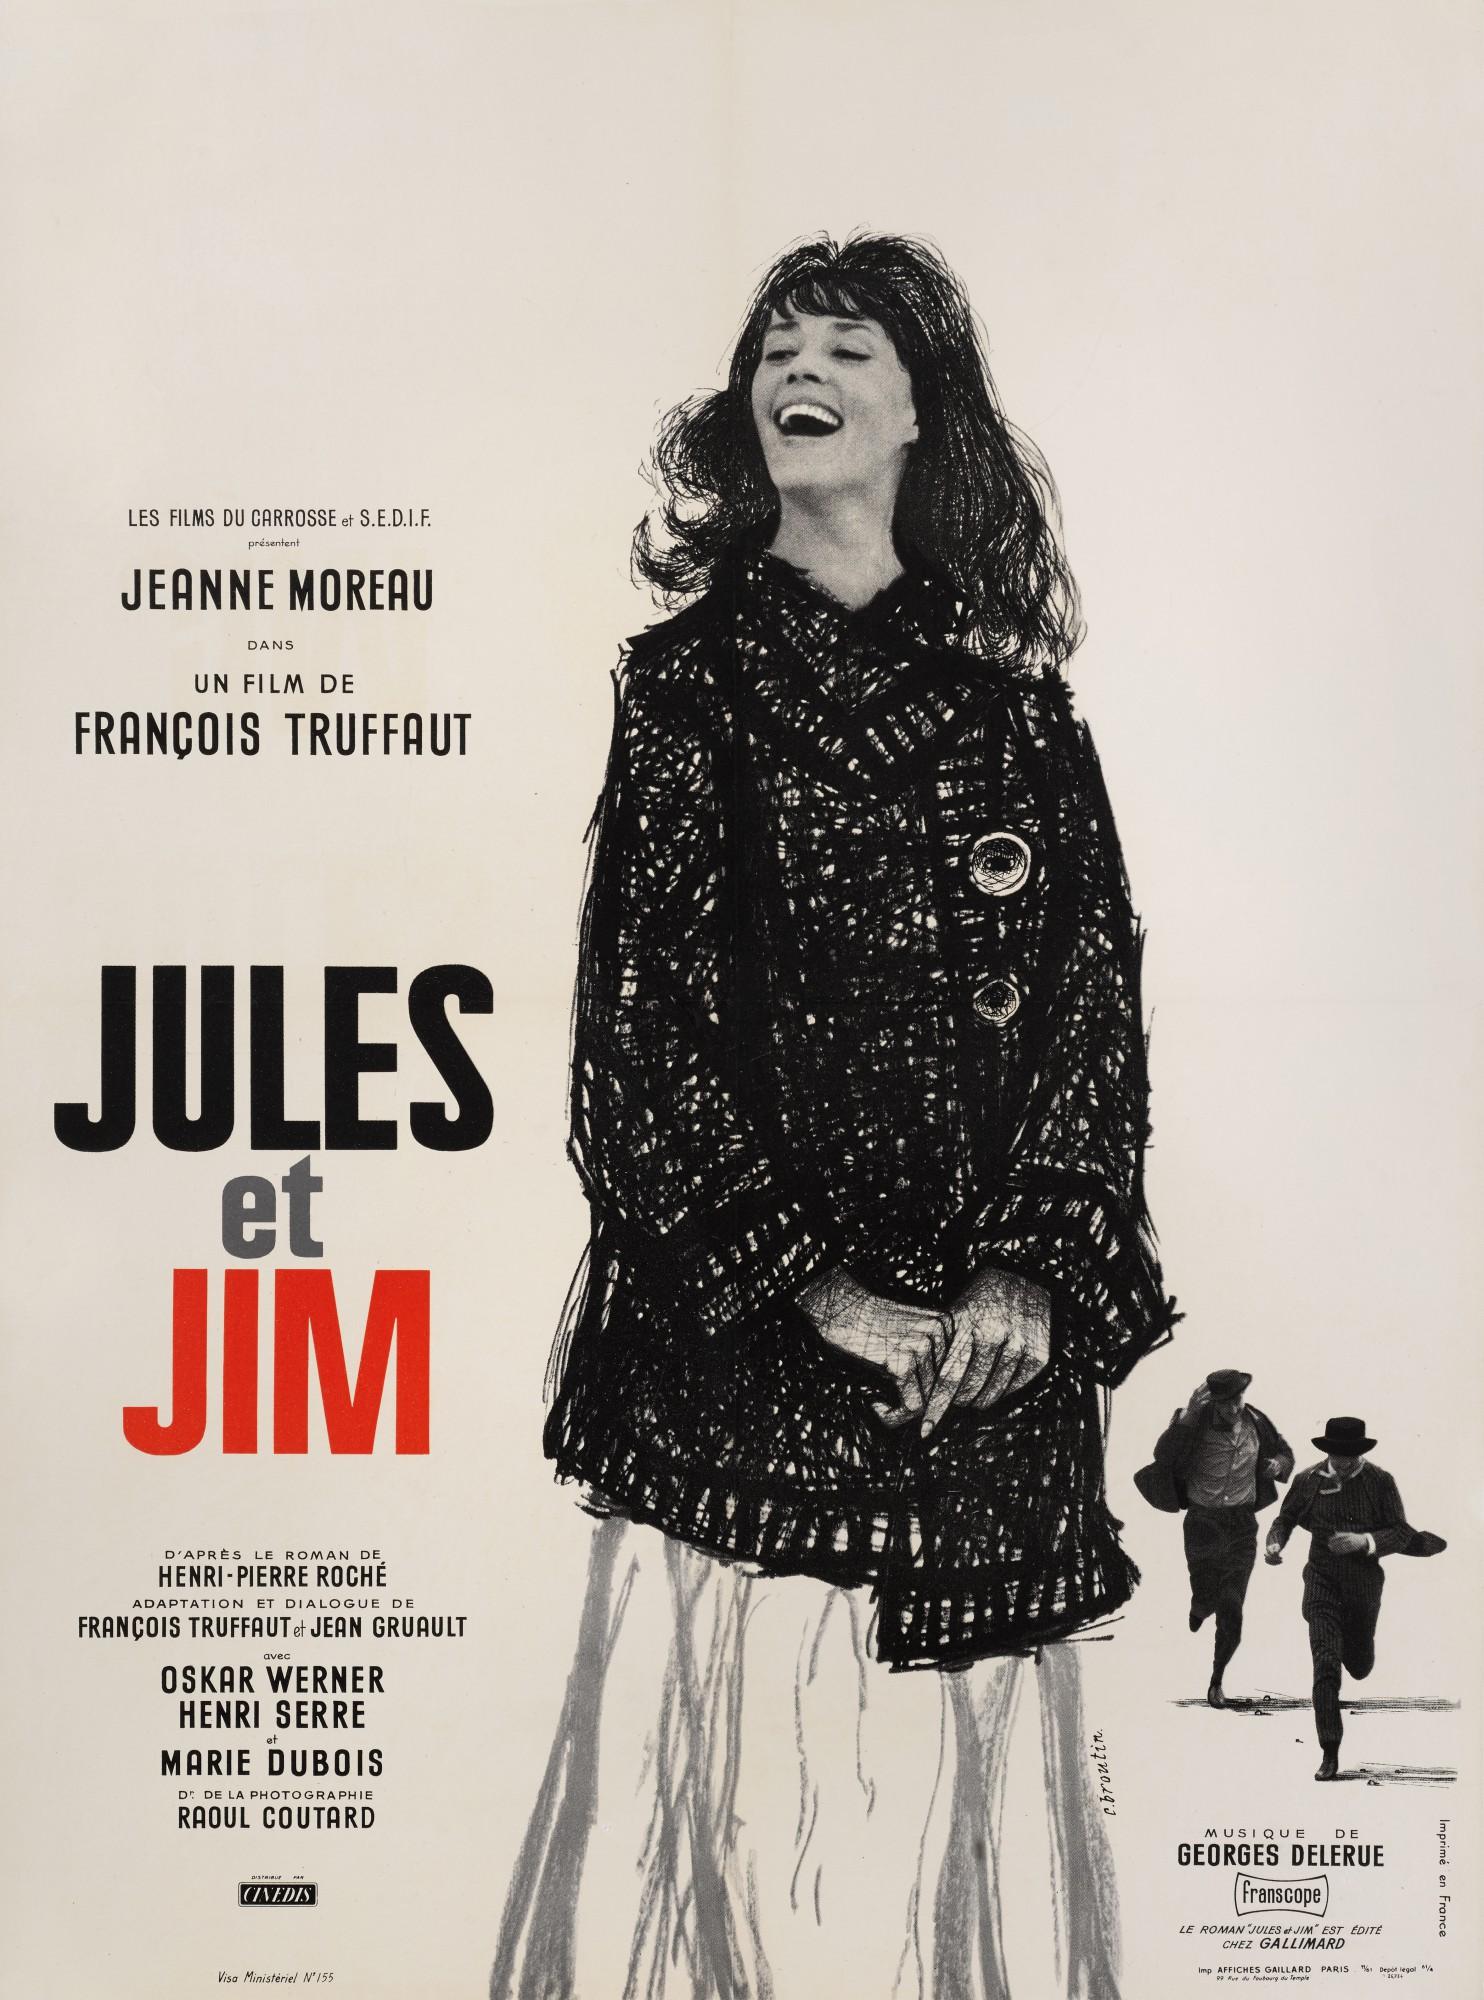 JULES ET JIM (1962) POSTER, FRENCH